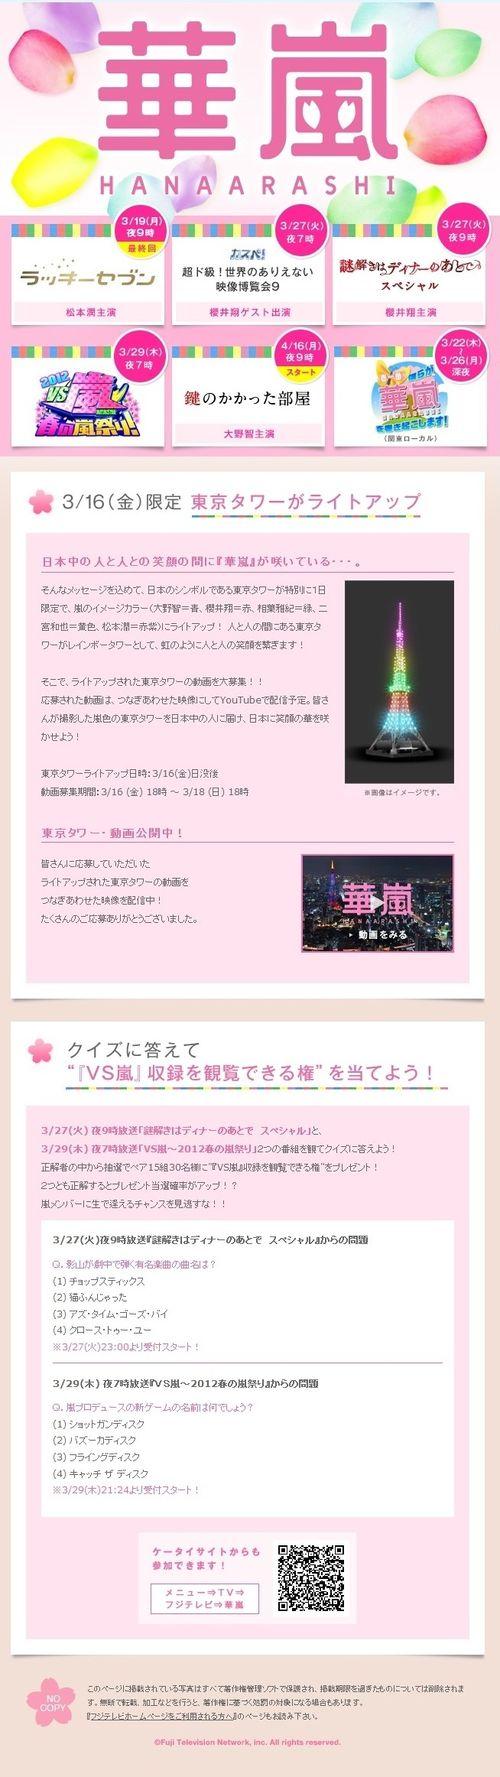 2012.03 HANA ARASHI 01